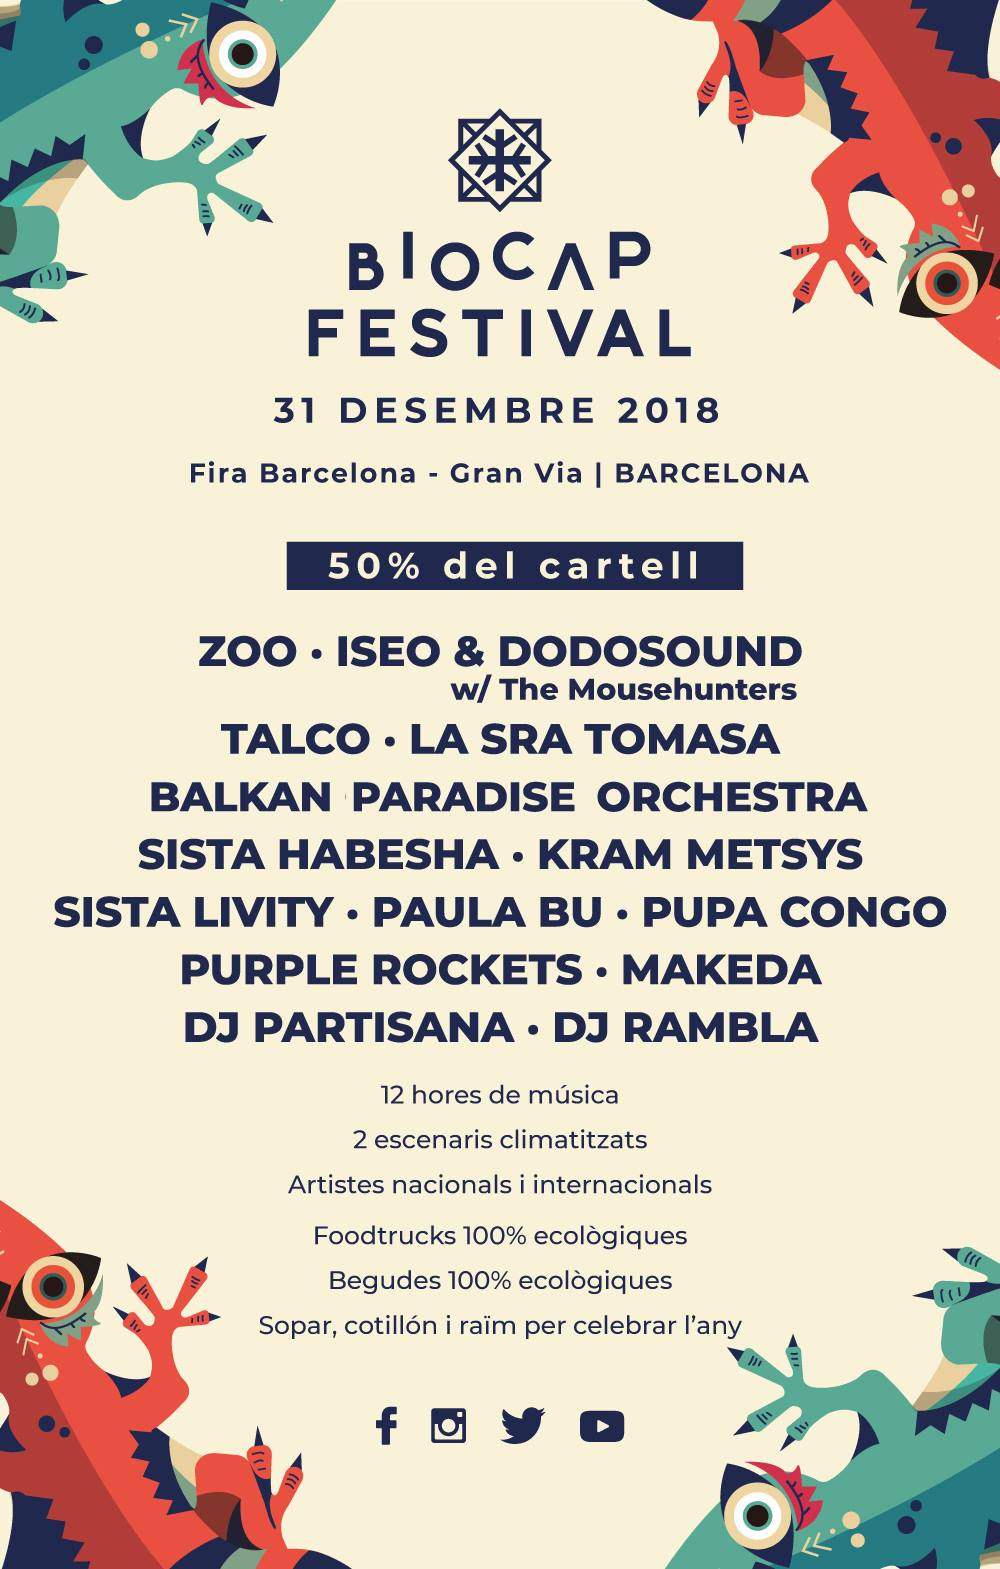 biocap festival 2018 2609